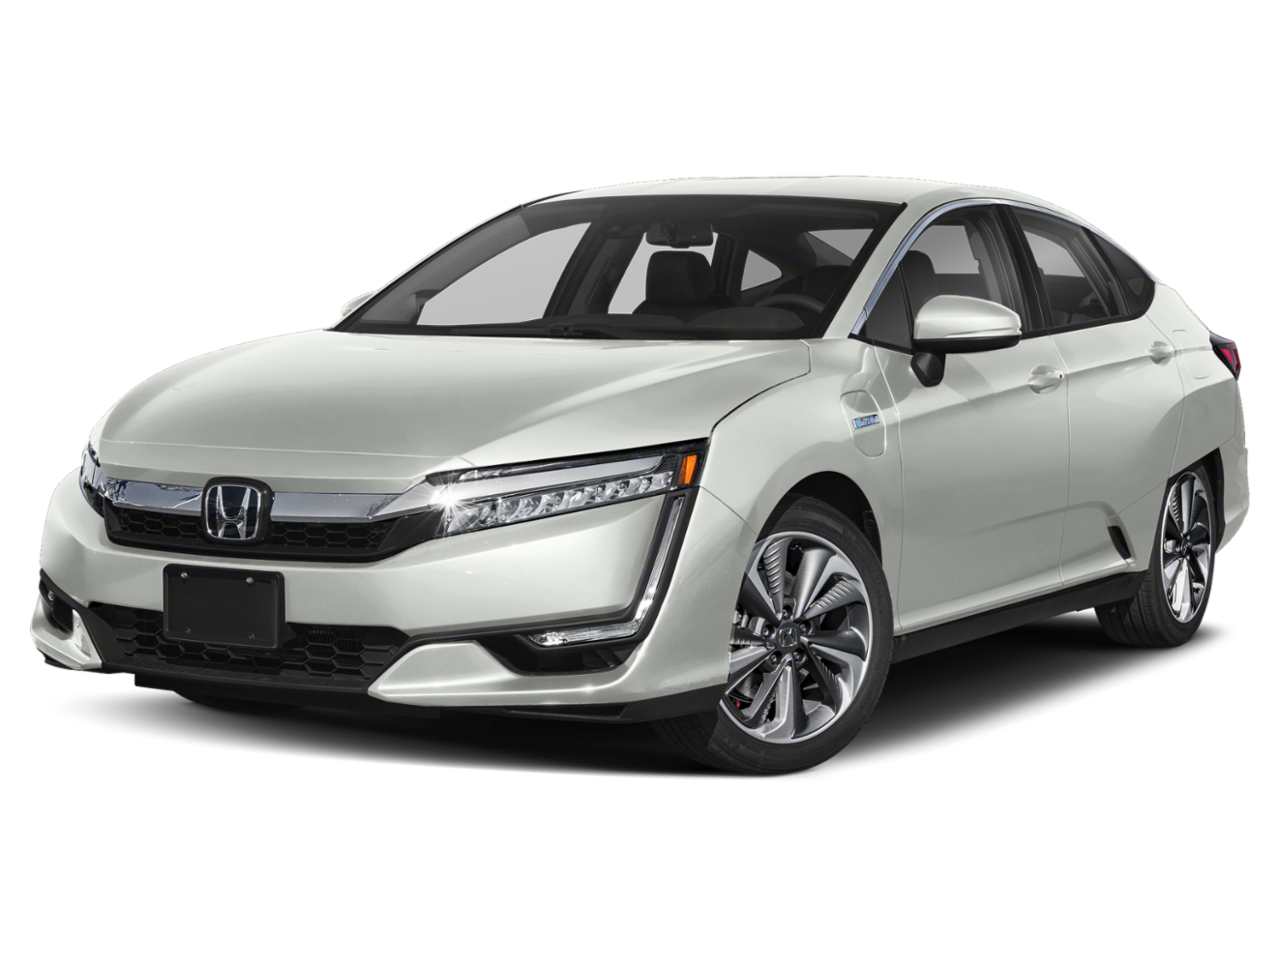 Honda 2020 Clarity Plug-In Hybrid Sedan